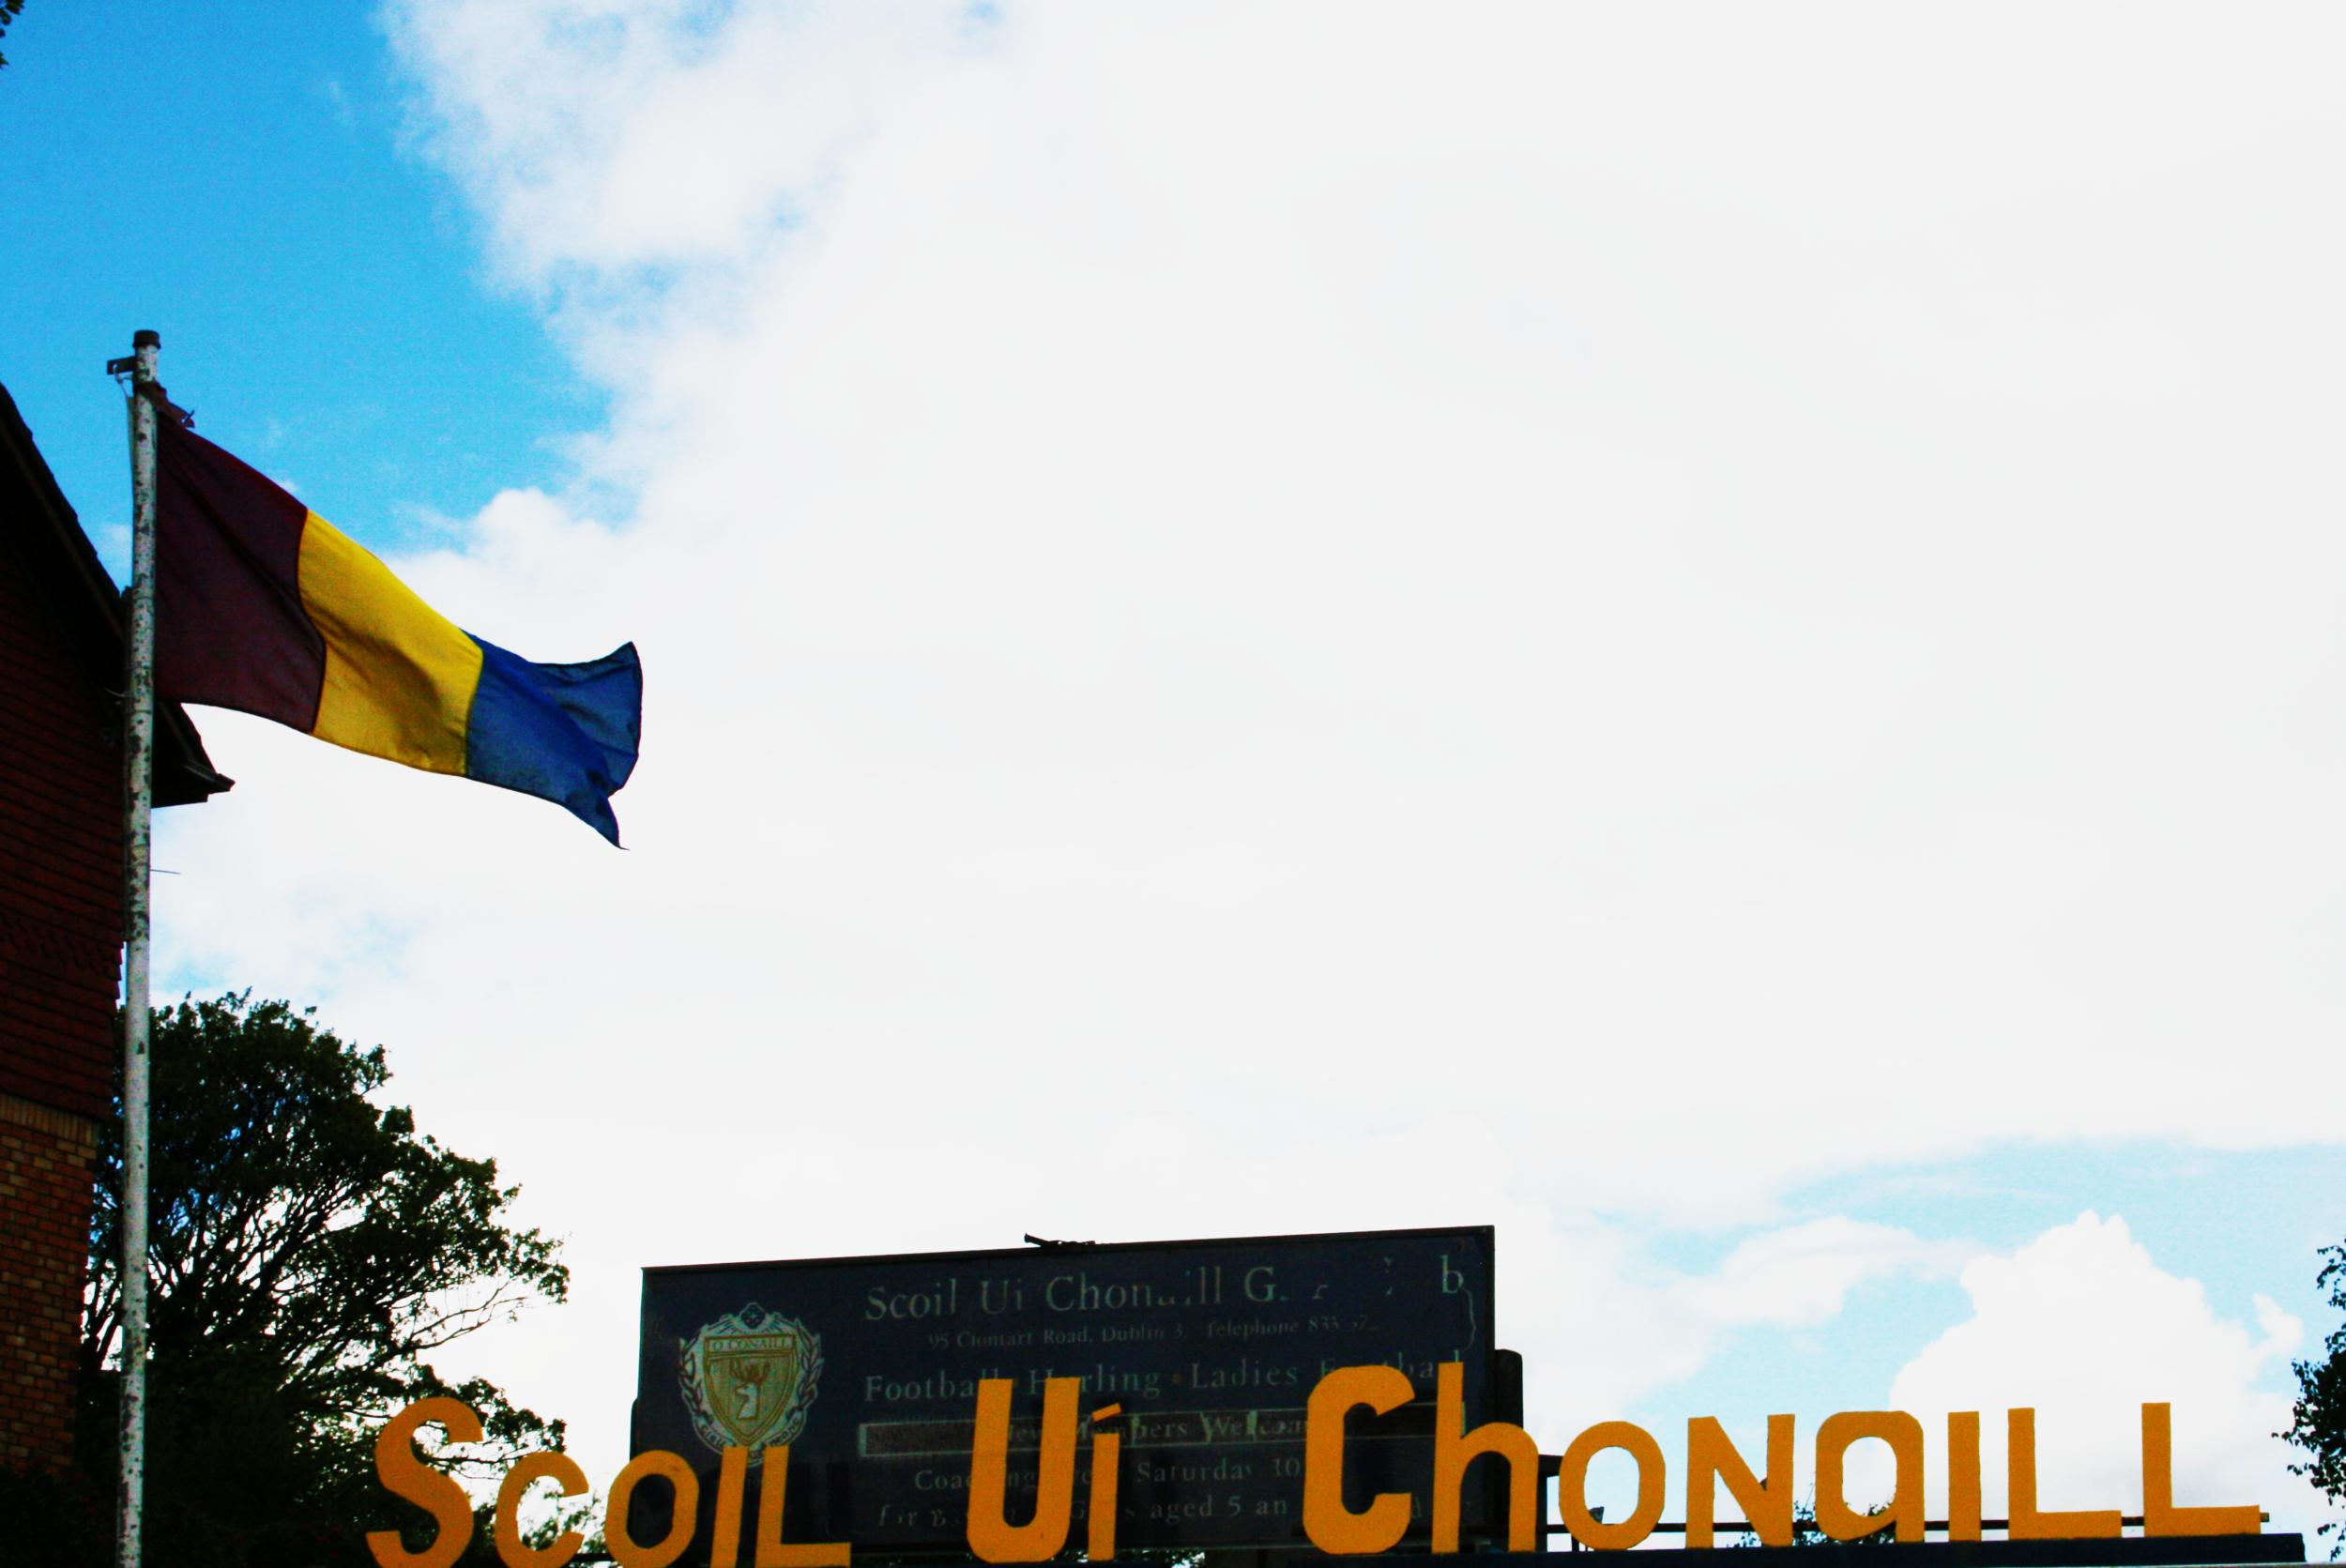 Scoil flag banner.png